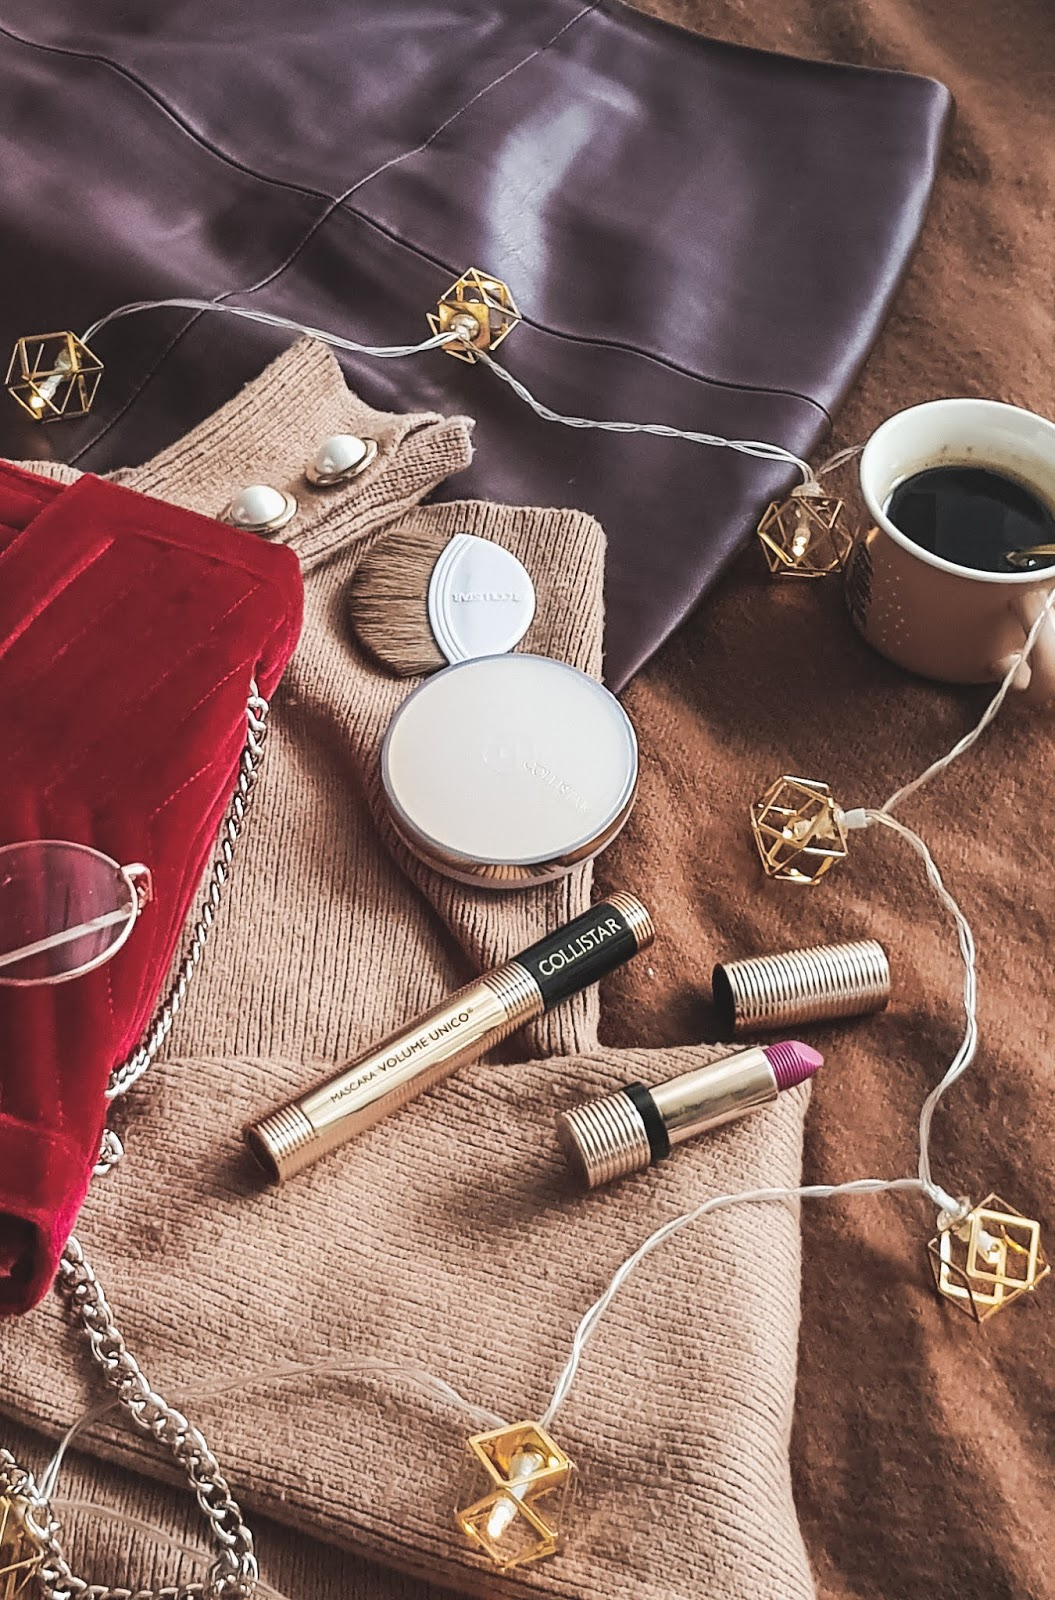 Kosmetyki collistar